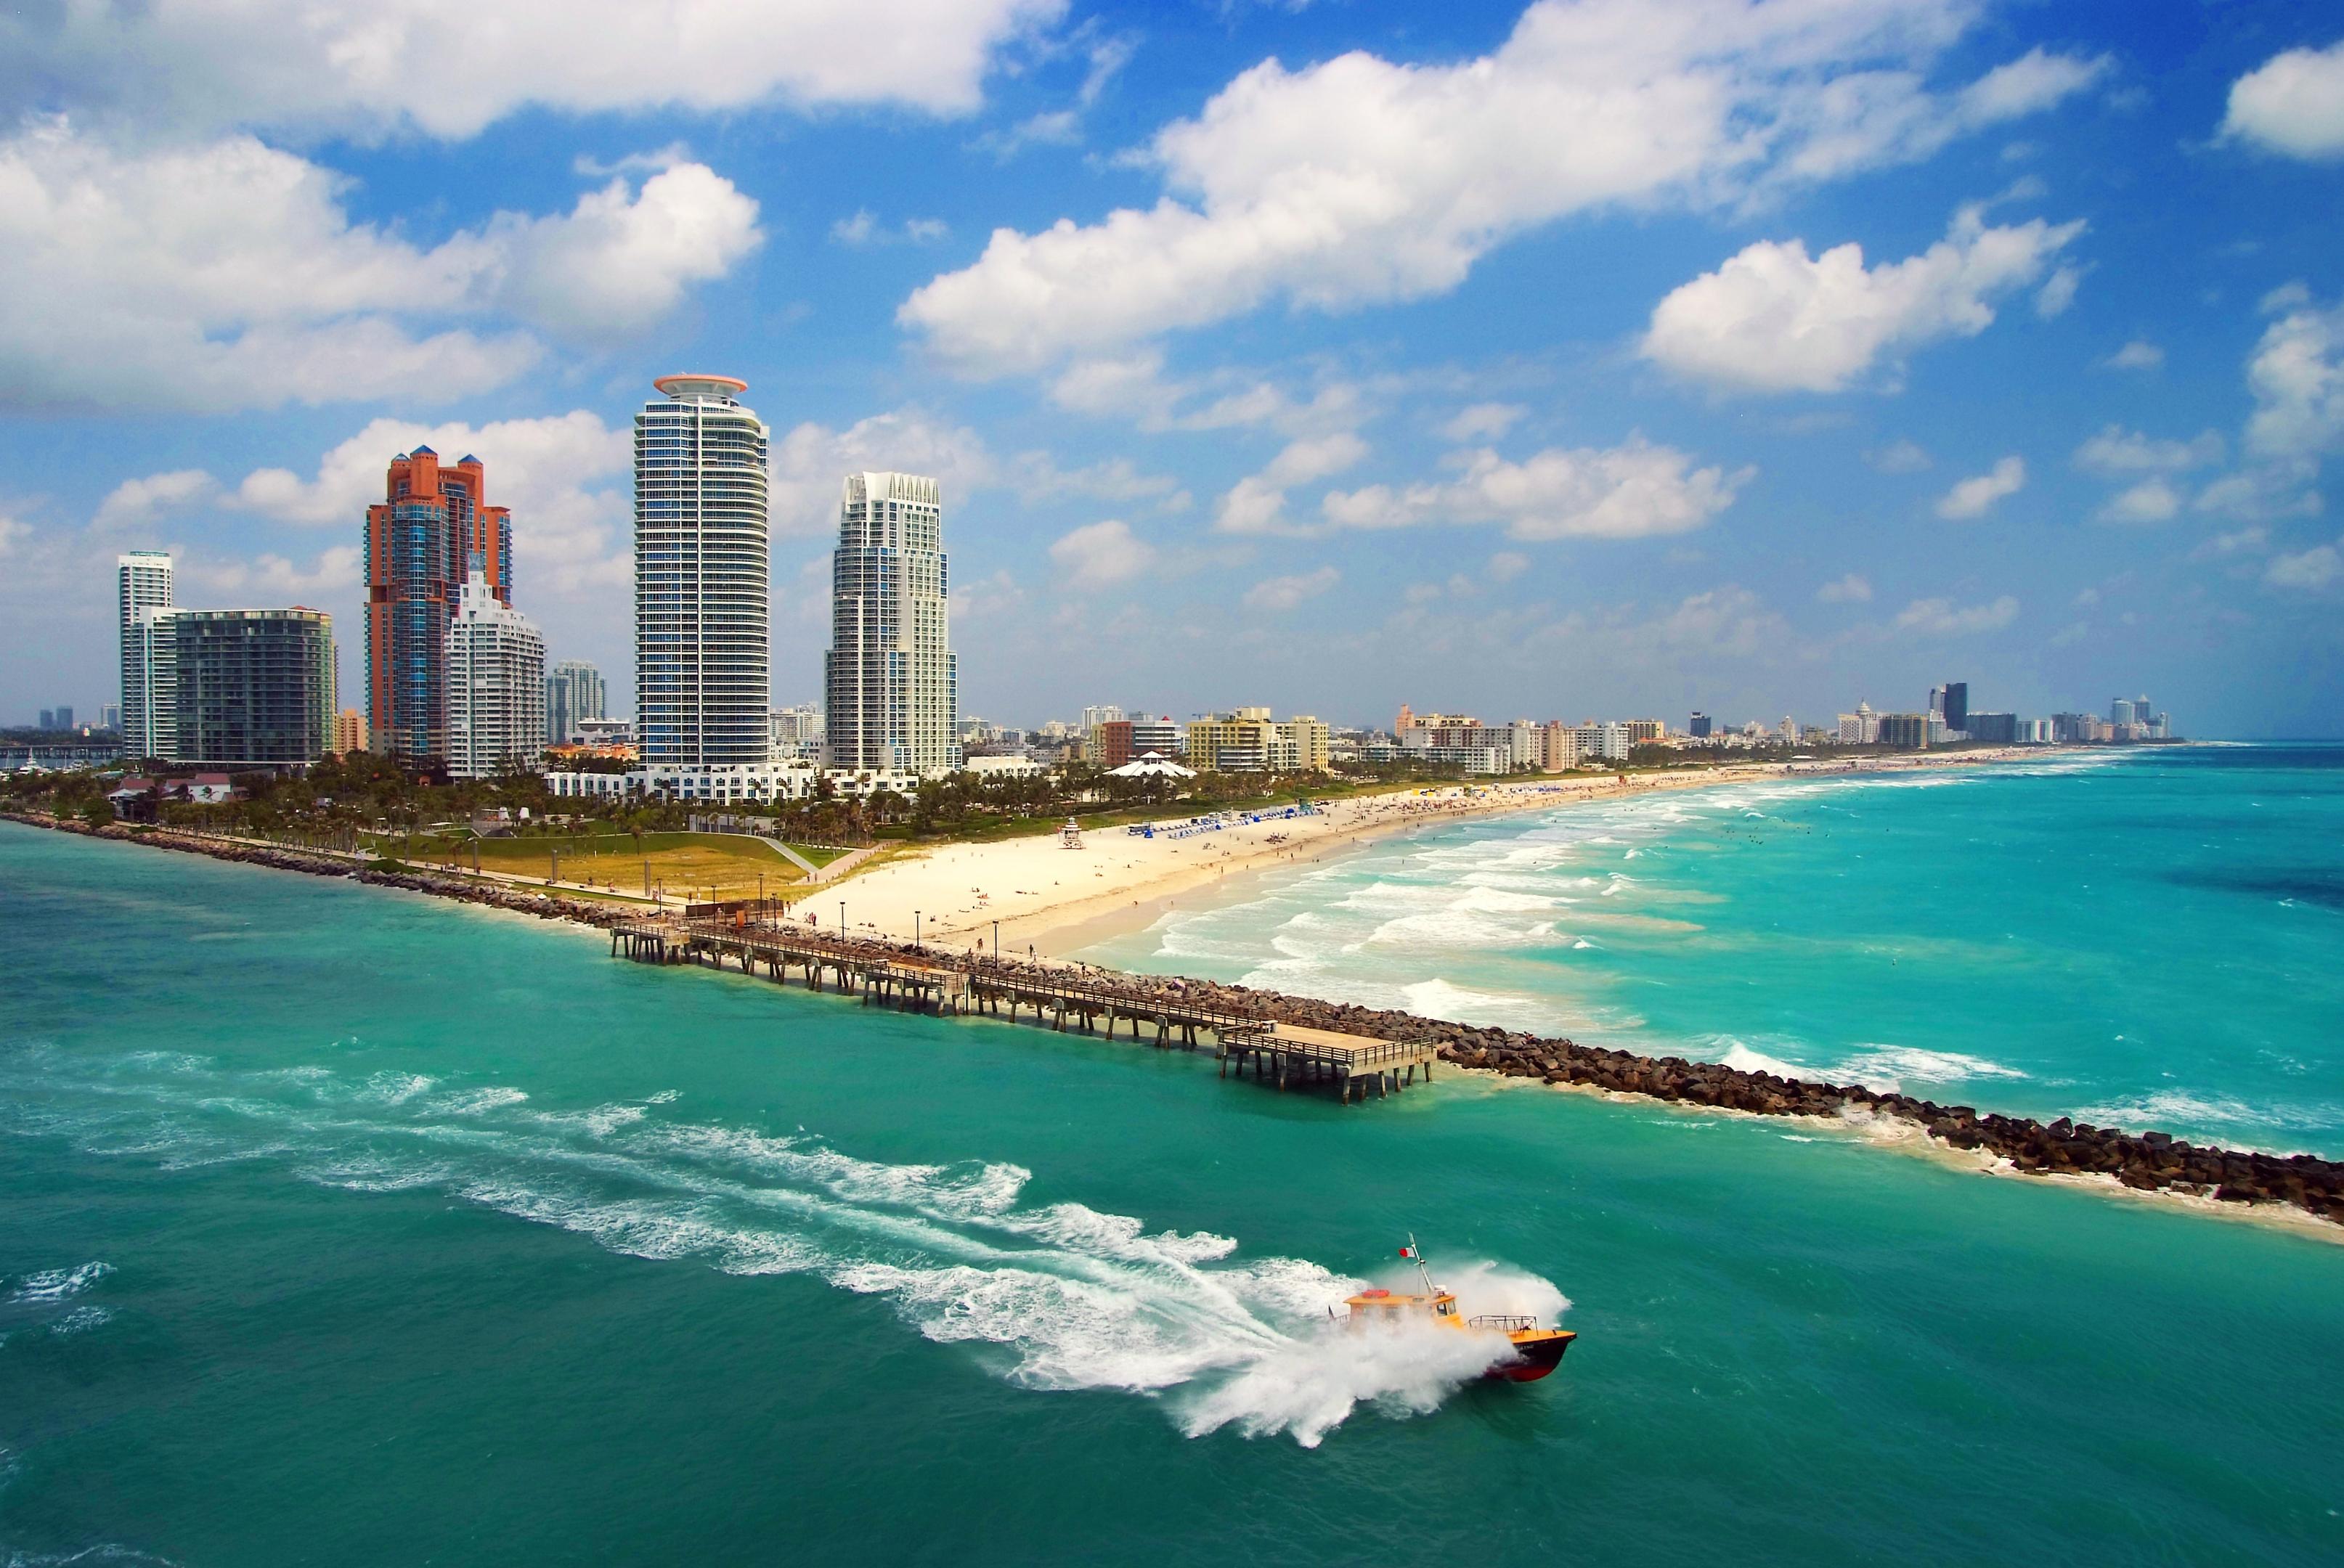 South Miami Beach (iStock)